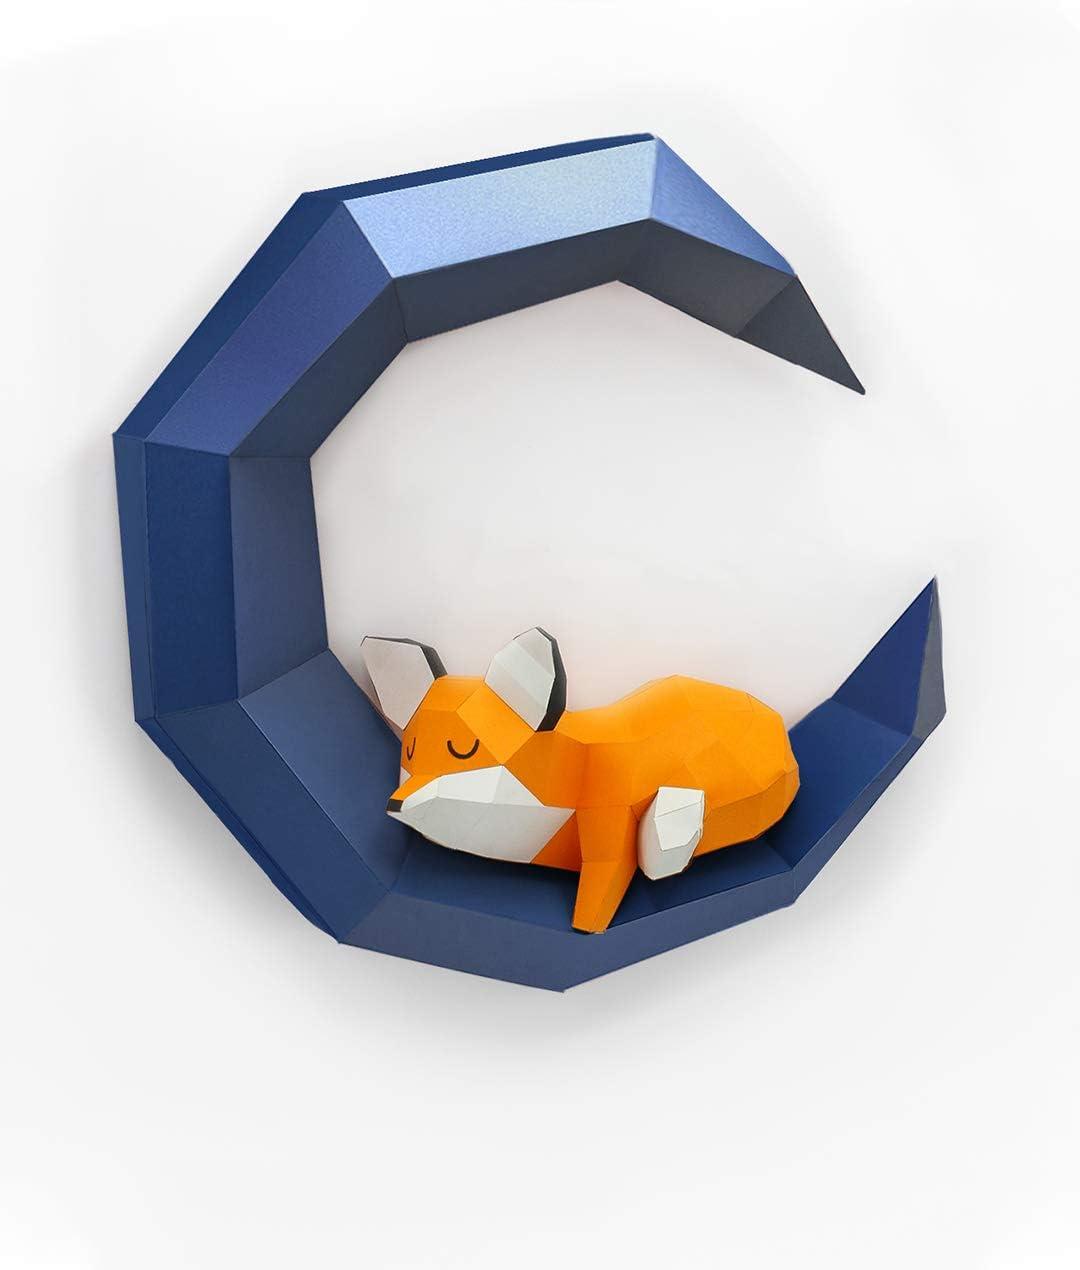 Holographiscer Mond Oh Glam Home Kit DIY Schlafender Fuchs auf dem Mond Papercraft Kit Wandtroph/äe Pappe 3D Origami Skulptur 3D Puzzle 3D Kinderdeko VORGESCHNITTEN